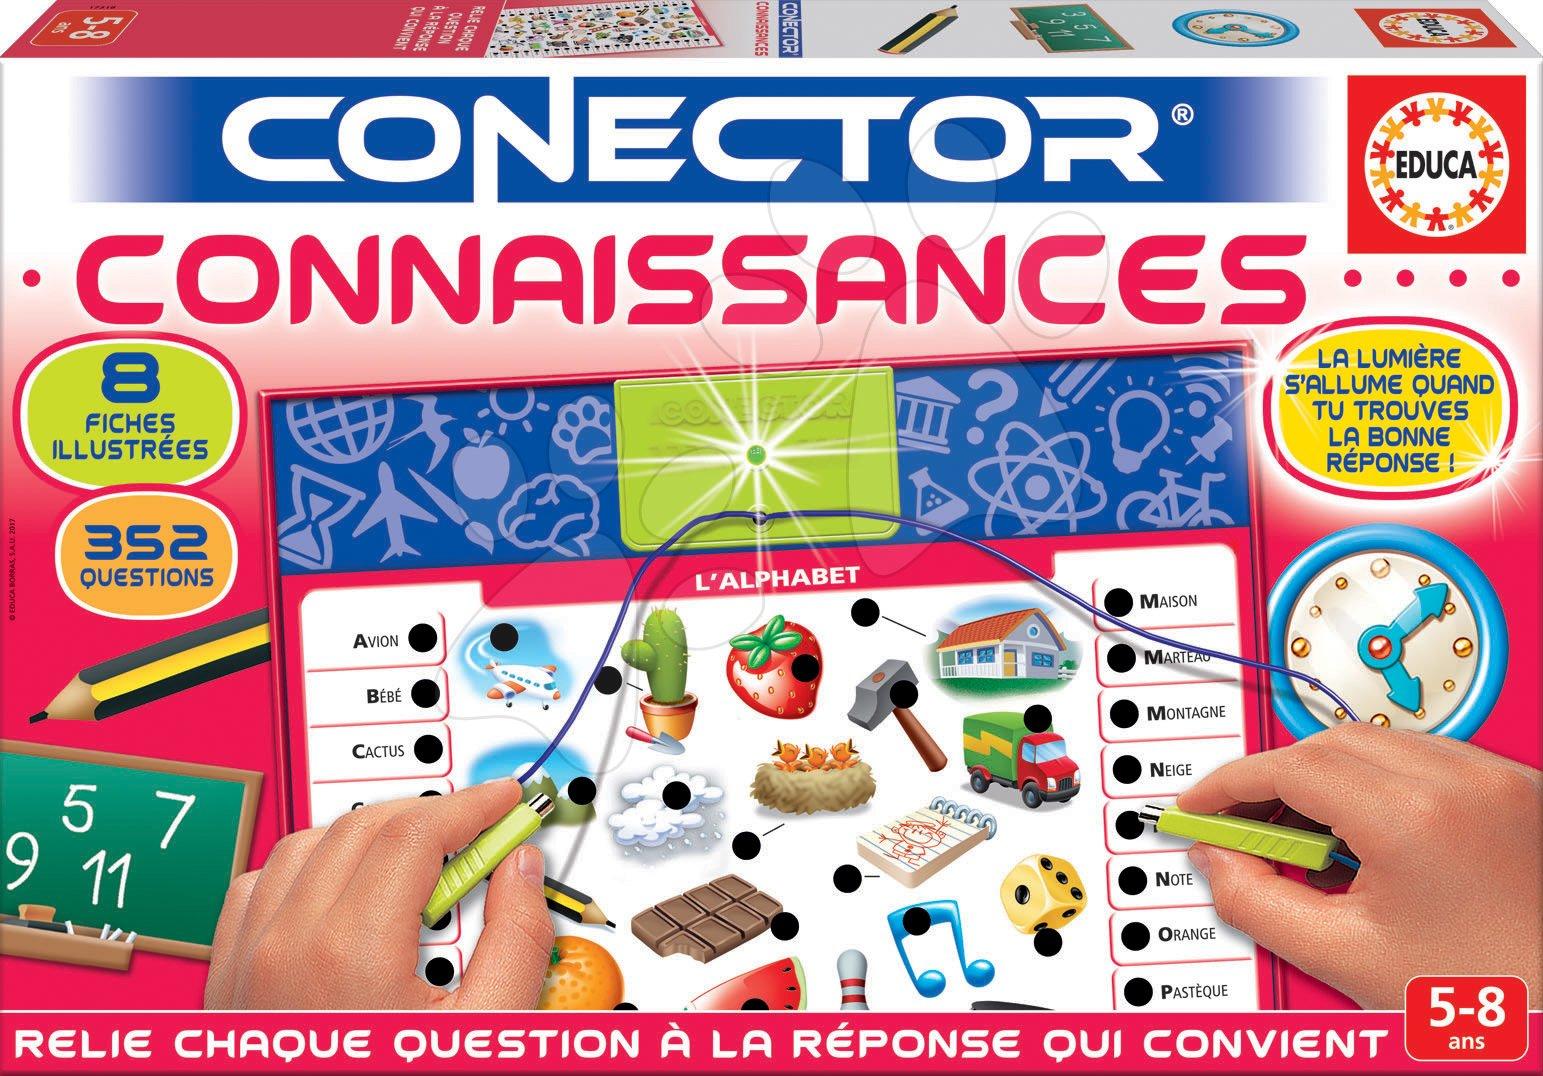 Společenská hra Conector Connaissances Educa francouzsky 352 otázek od 5 let